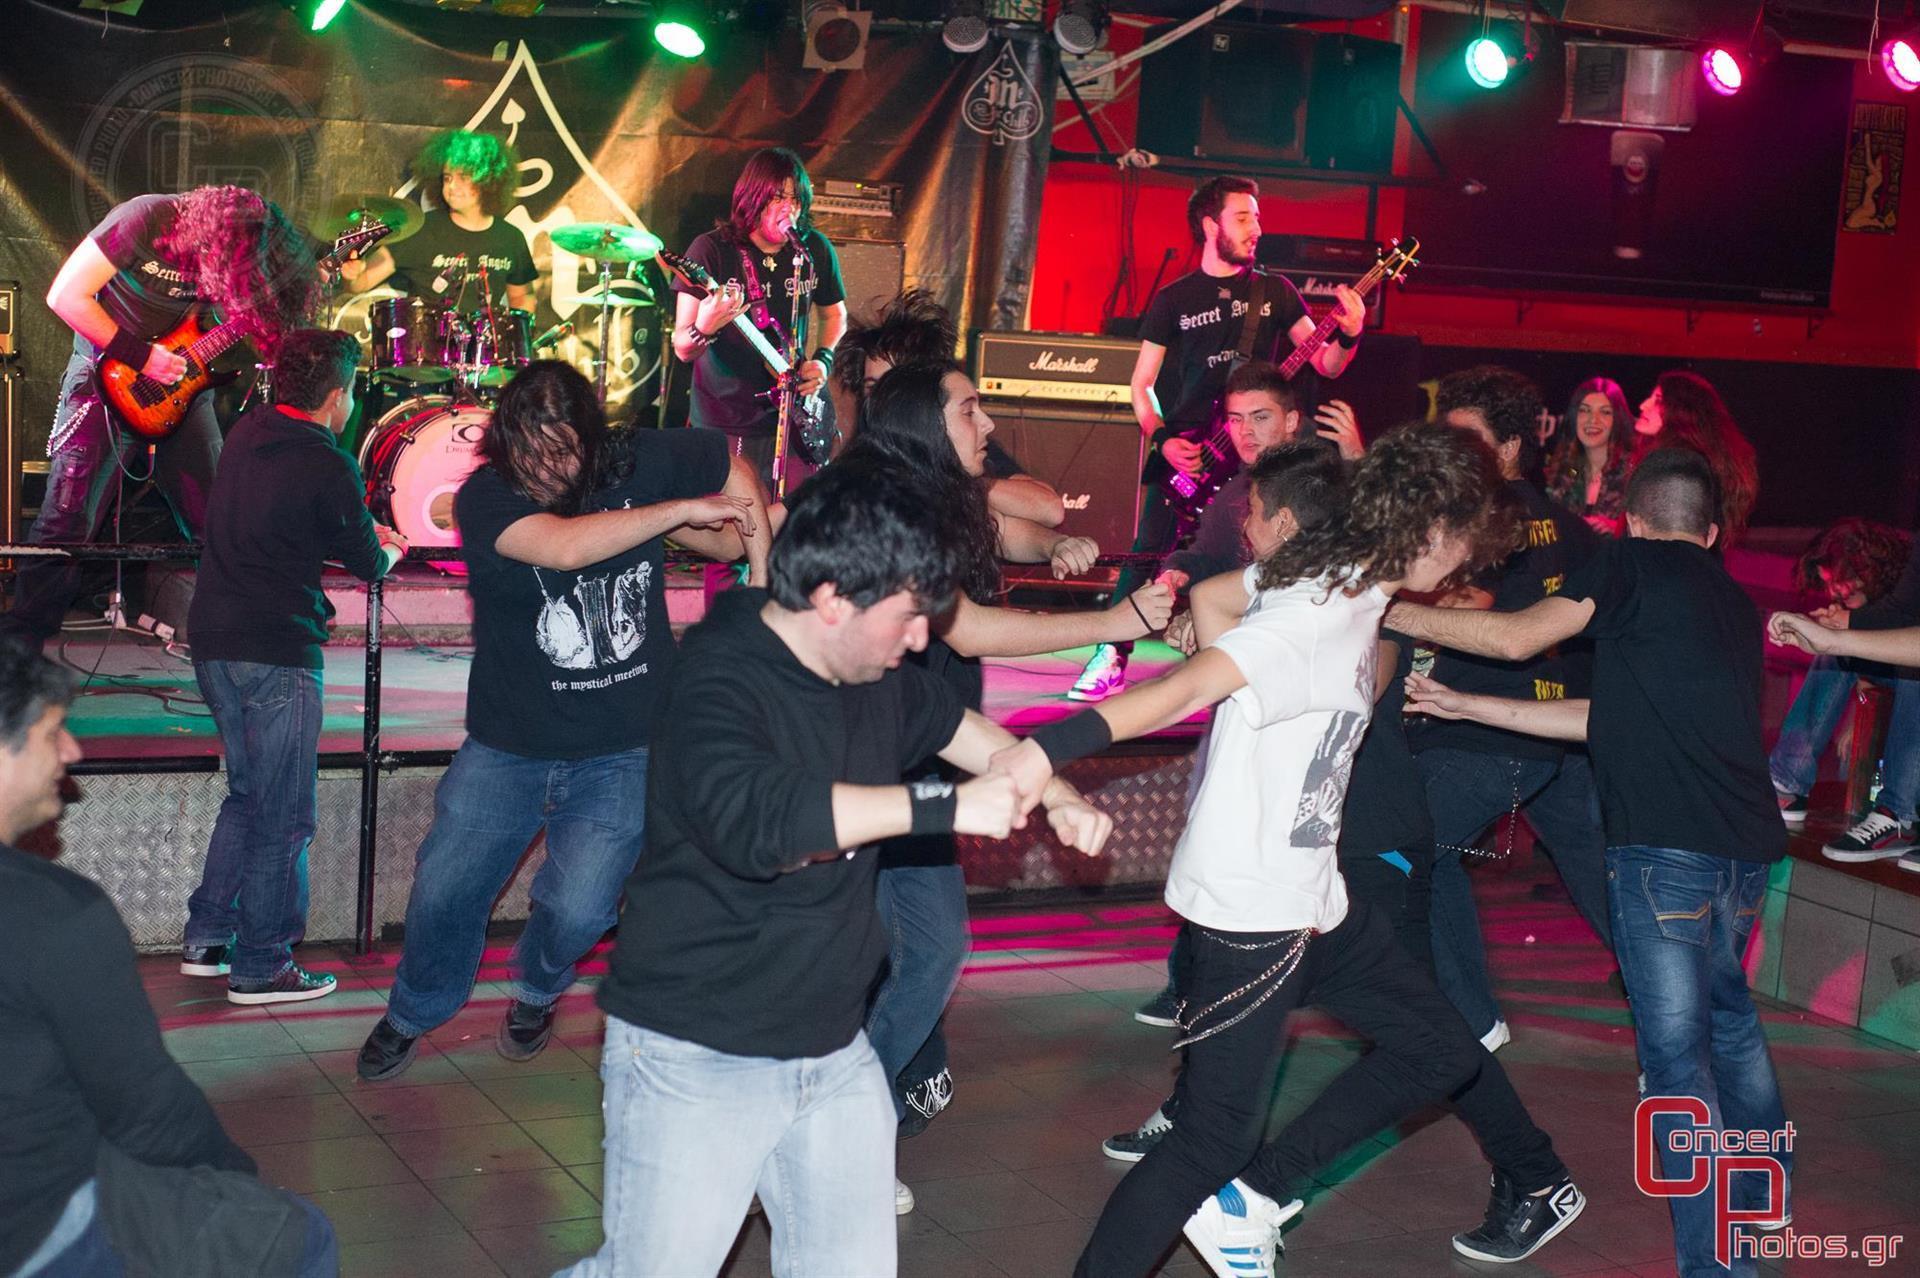 Battle Of The Bands Athens - Leg 3- photographer:  - ConcertPhotos - 20150104_2336_47